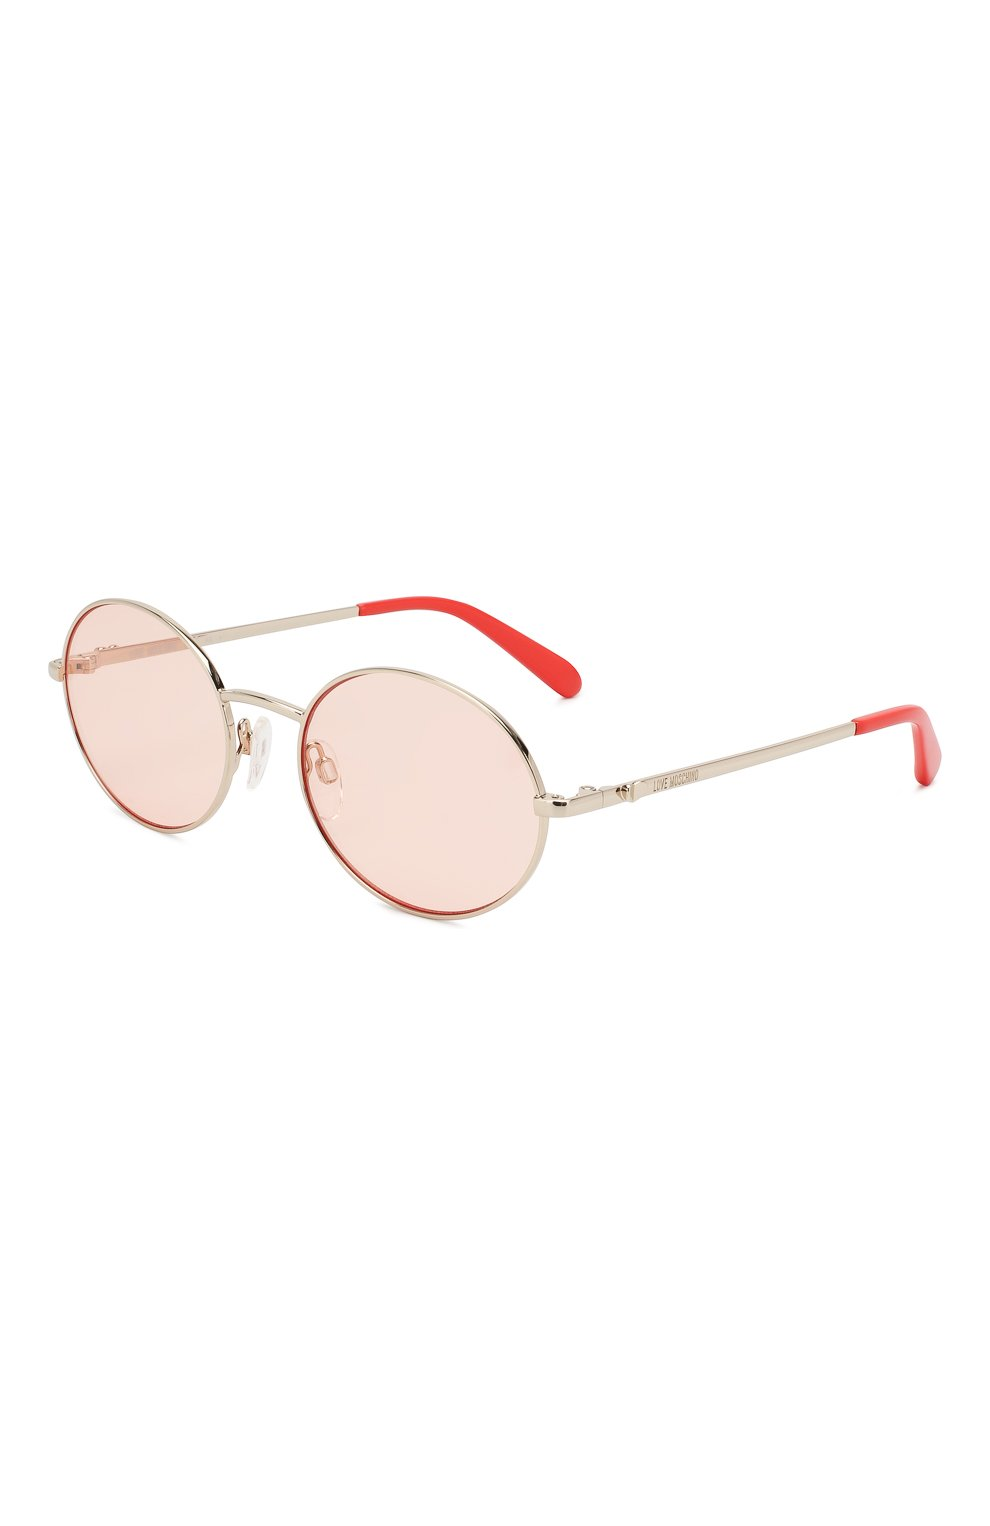 Женские солнцезащитные очки MOSCHINO светло-розового цвета, арт. M0L013 1N5 | Фото 1